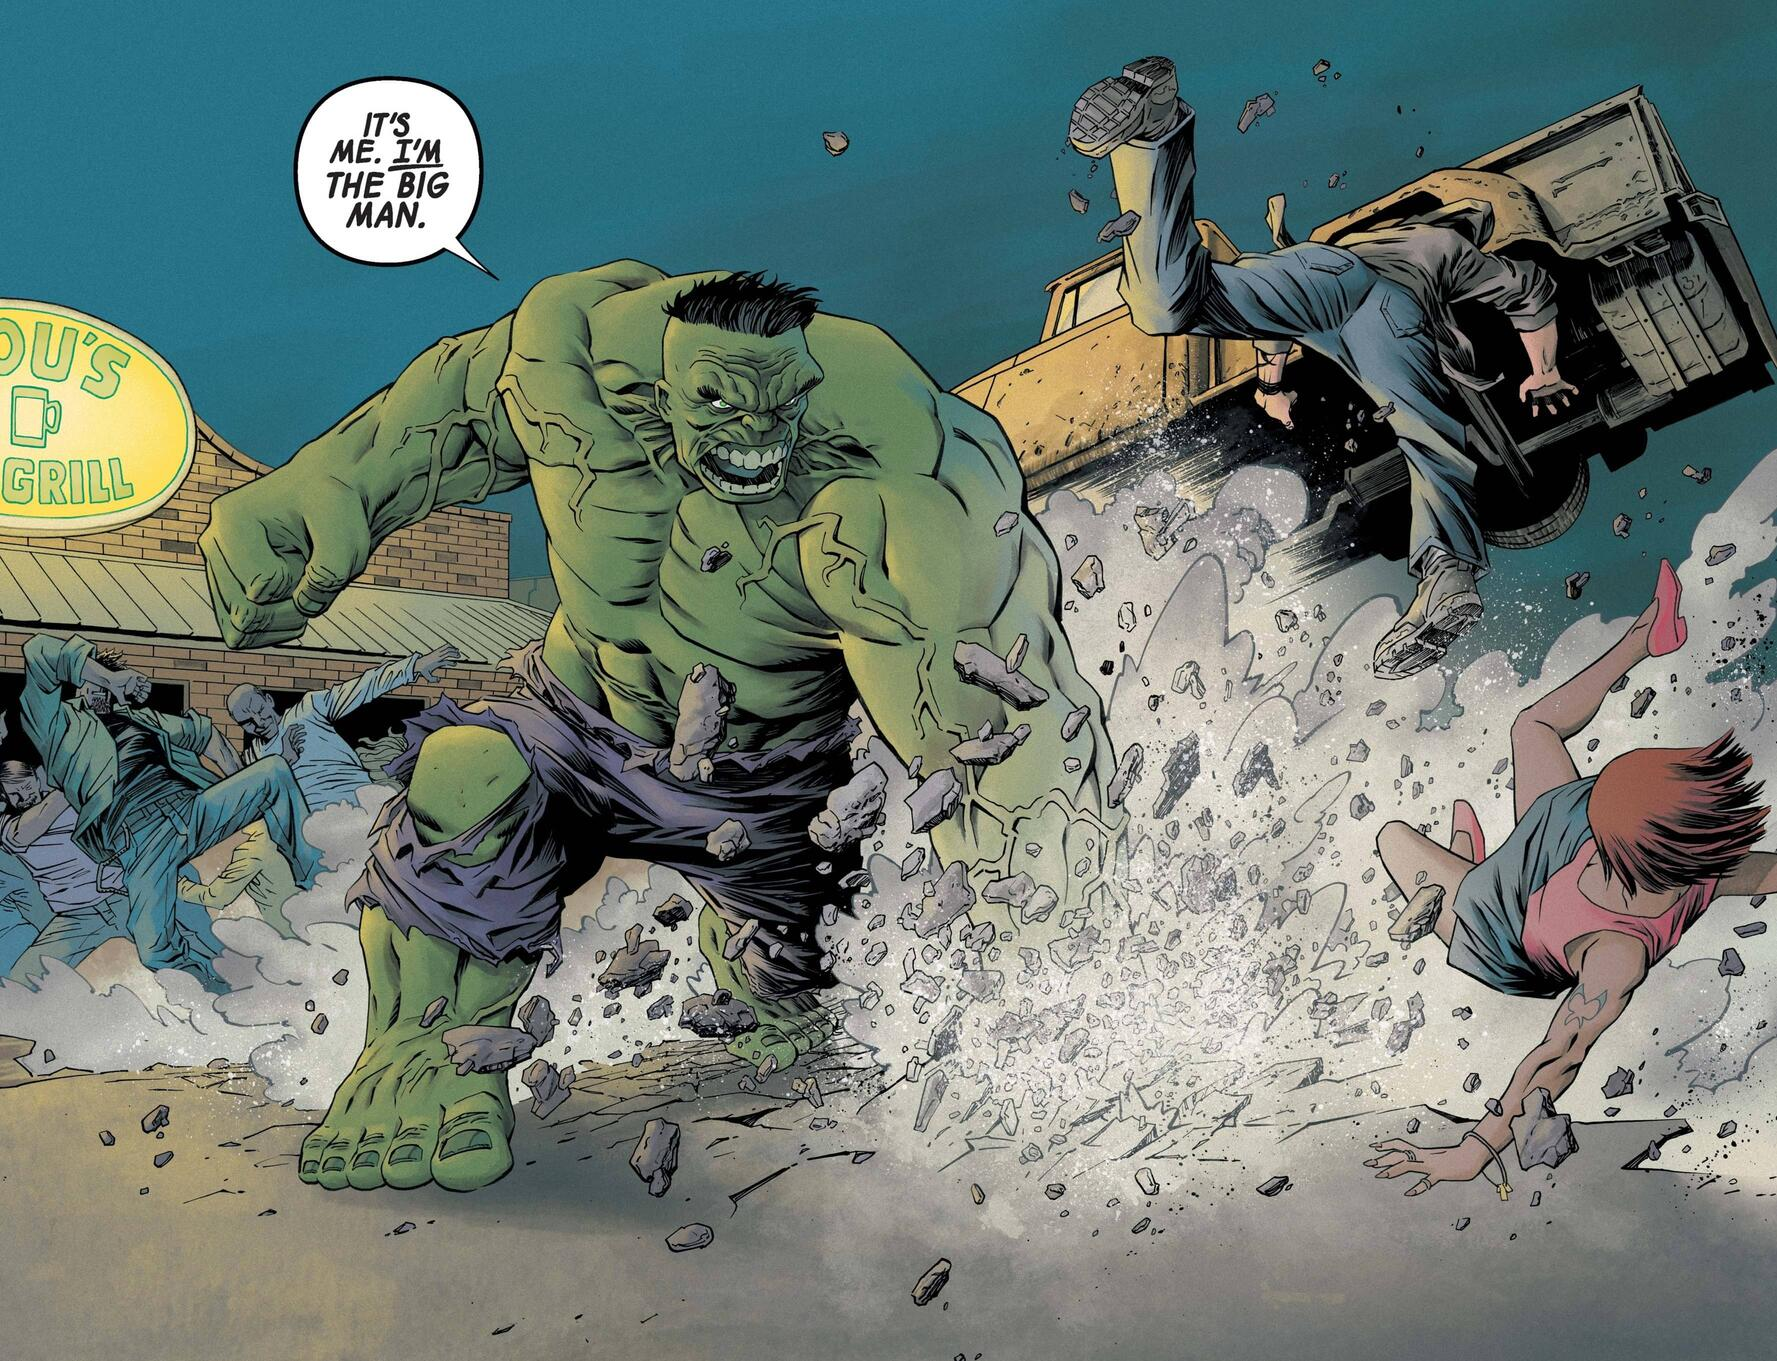 Immortal Hulk crashes the scene in New Mexico.